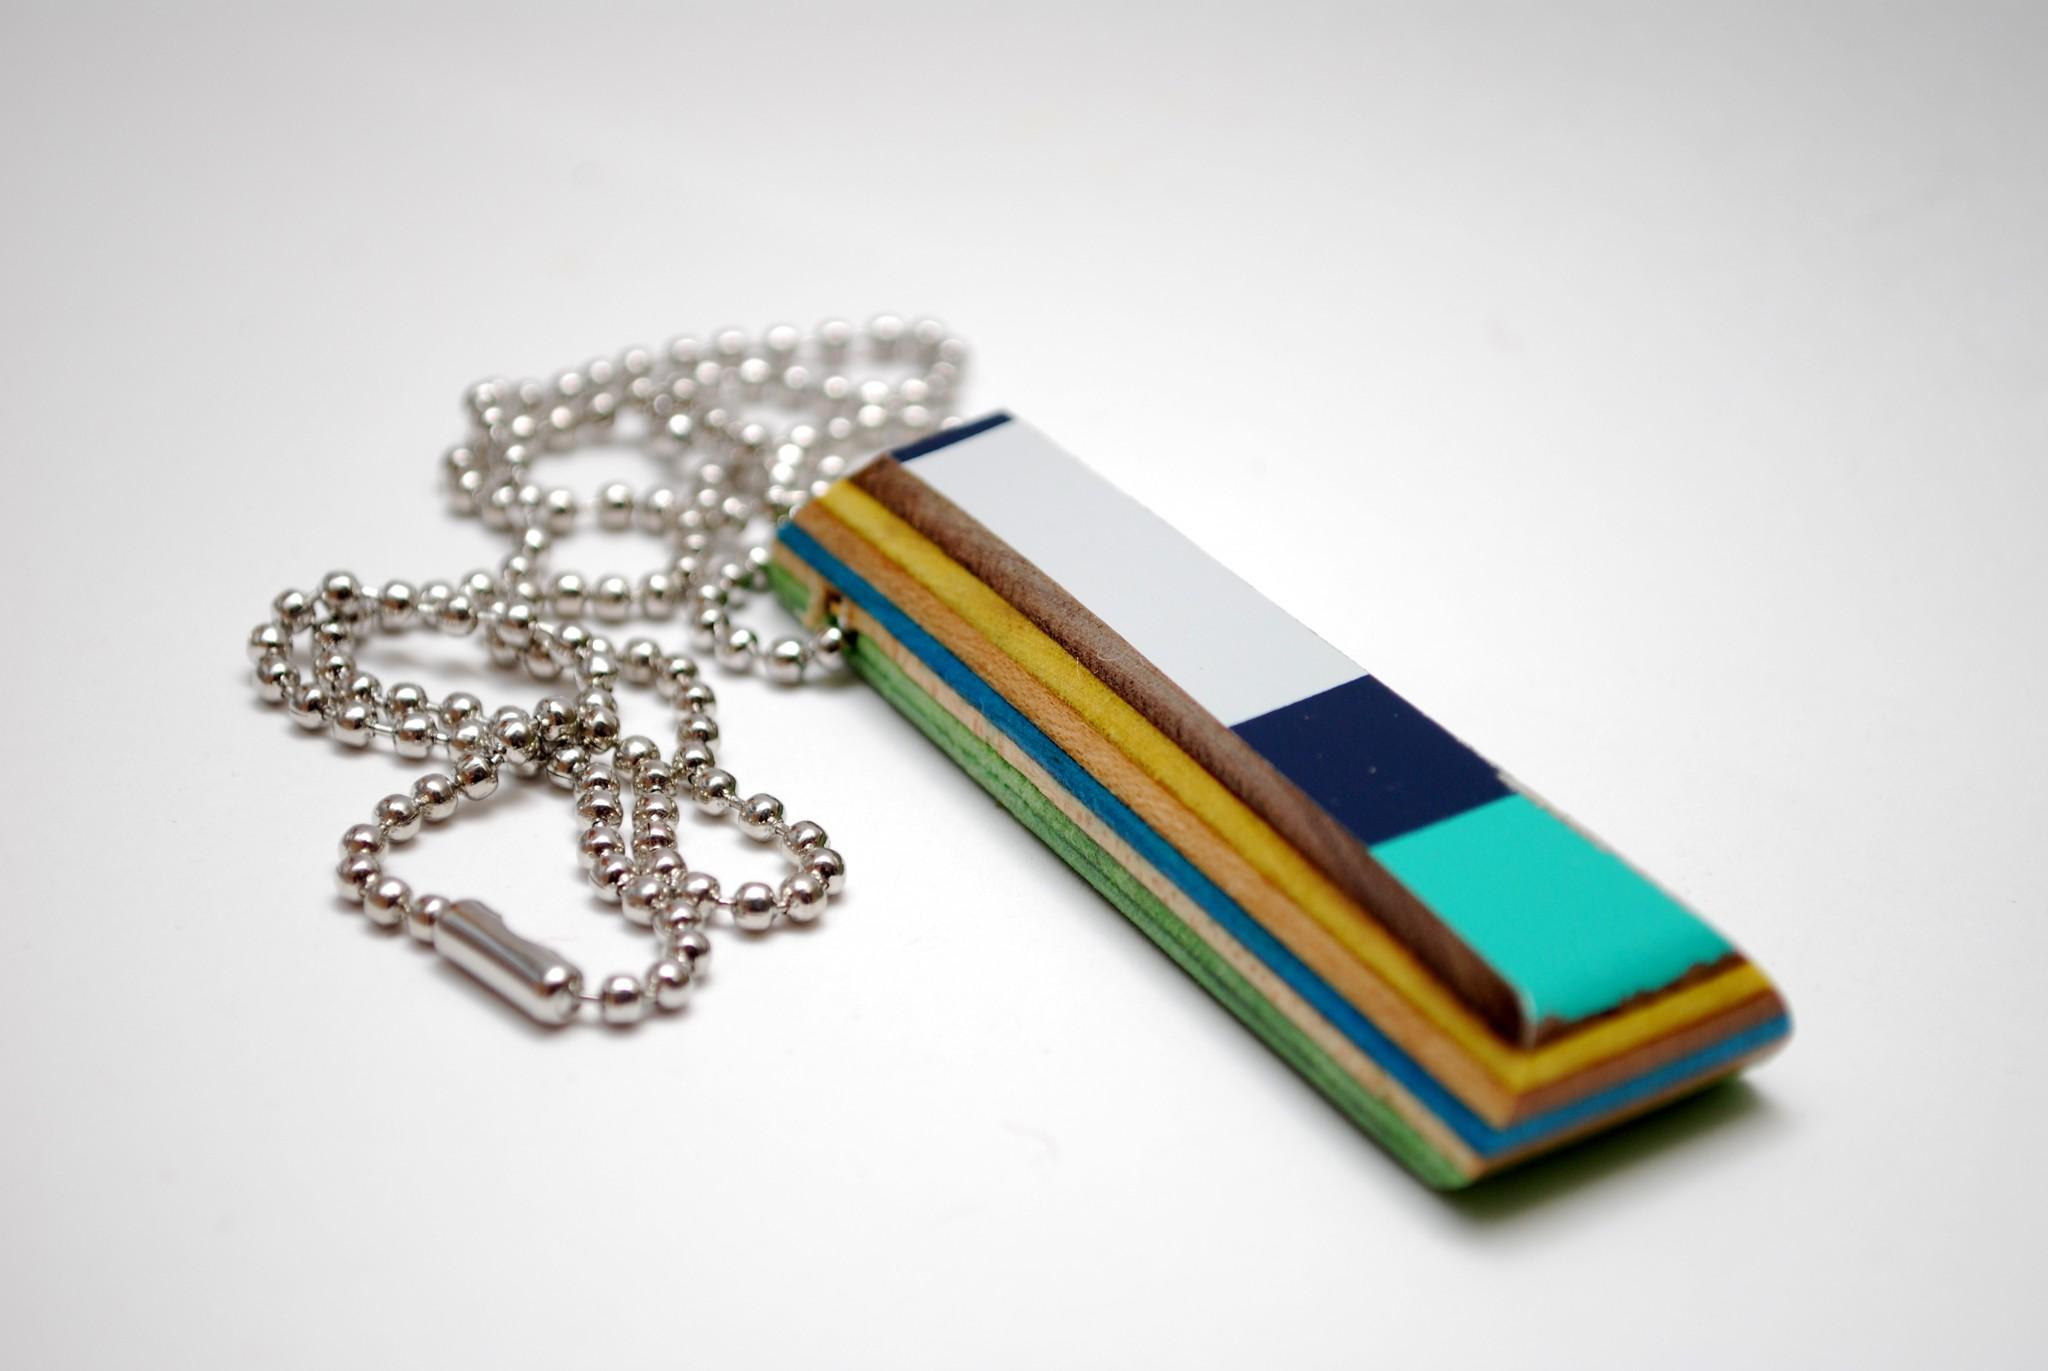 broken skateboards, jewelry, ring, gift